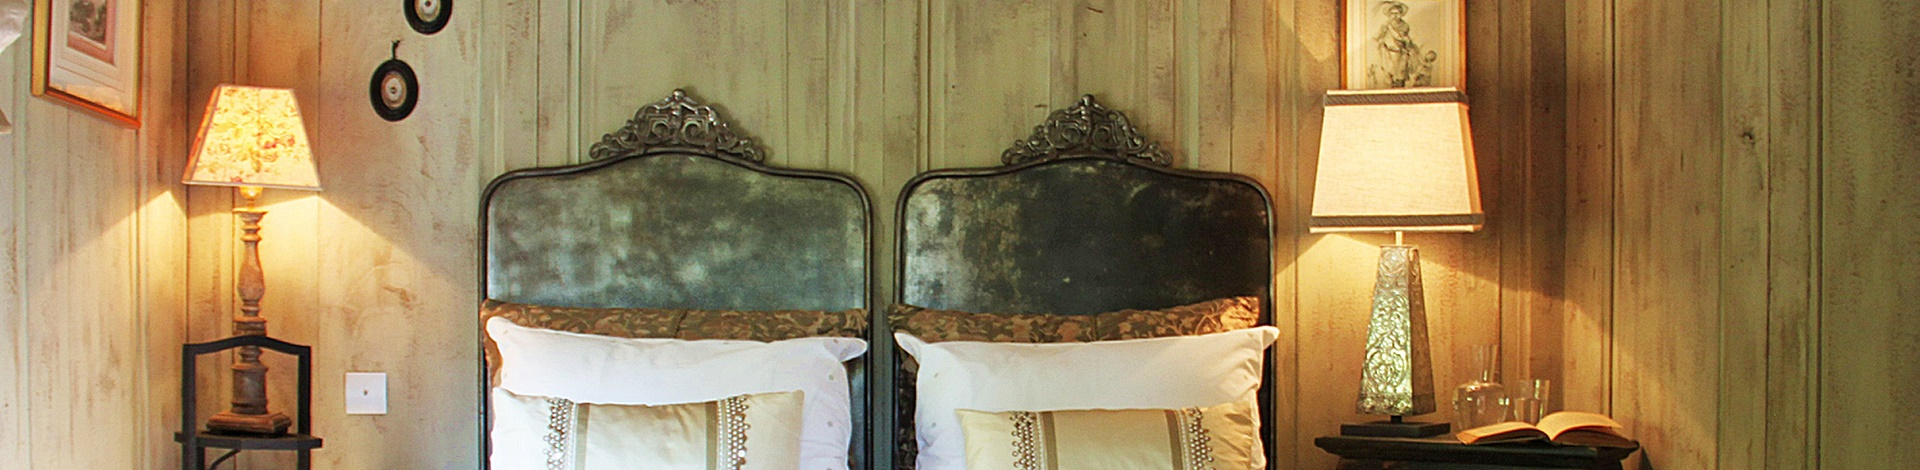 inspiration hotelbilder im shabby look. Black Bedroom Furniture Sets. Home Design Ideas